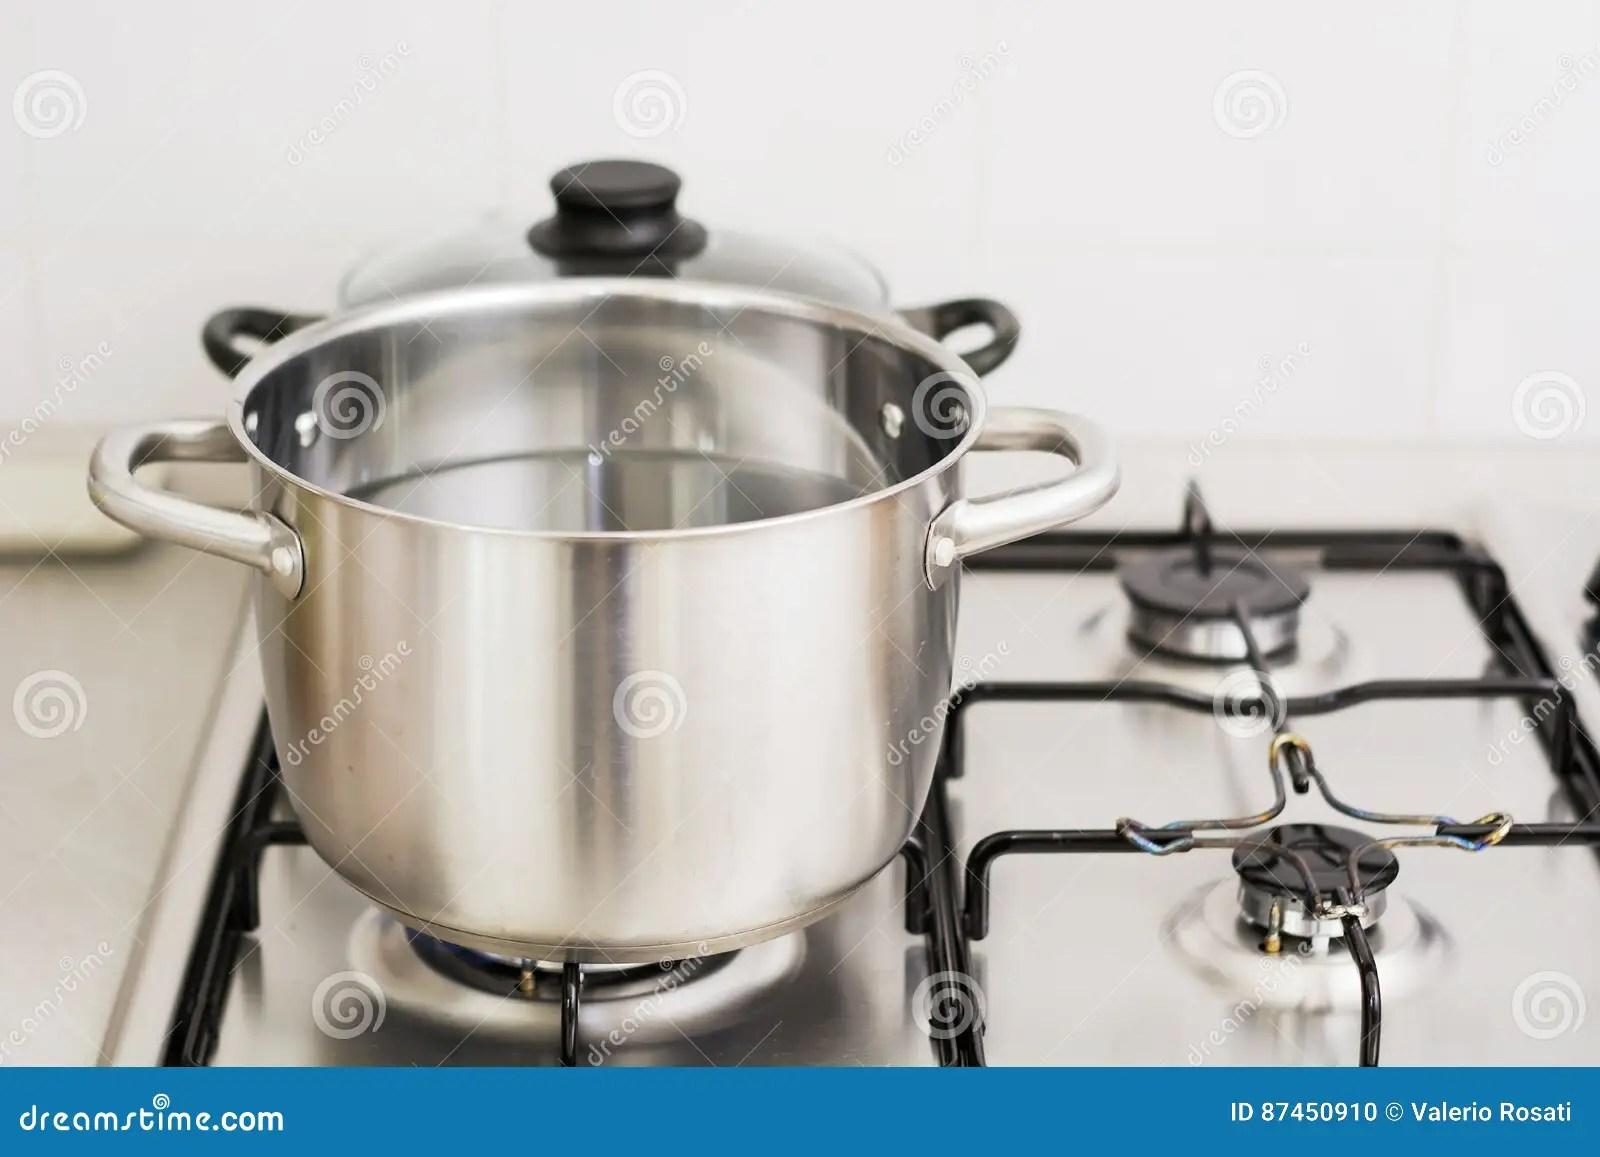 kitchen canister faucets parts 在烹调气体厨房罐不锈钢火炉utensiles墙壁之后库存照片 图片包括有丙烷 在烹调气体厨房罐不锈钢火炉utensiles墙壁之后